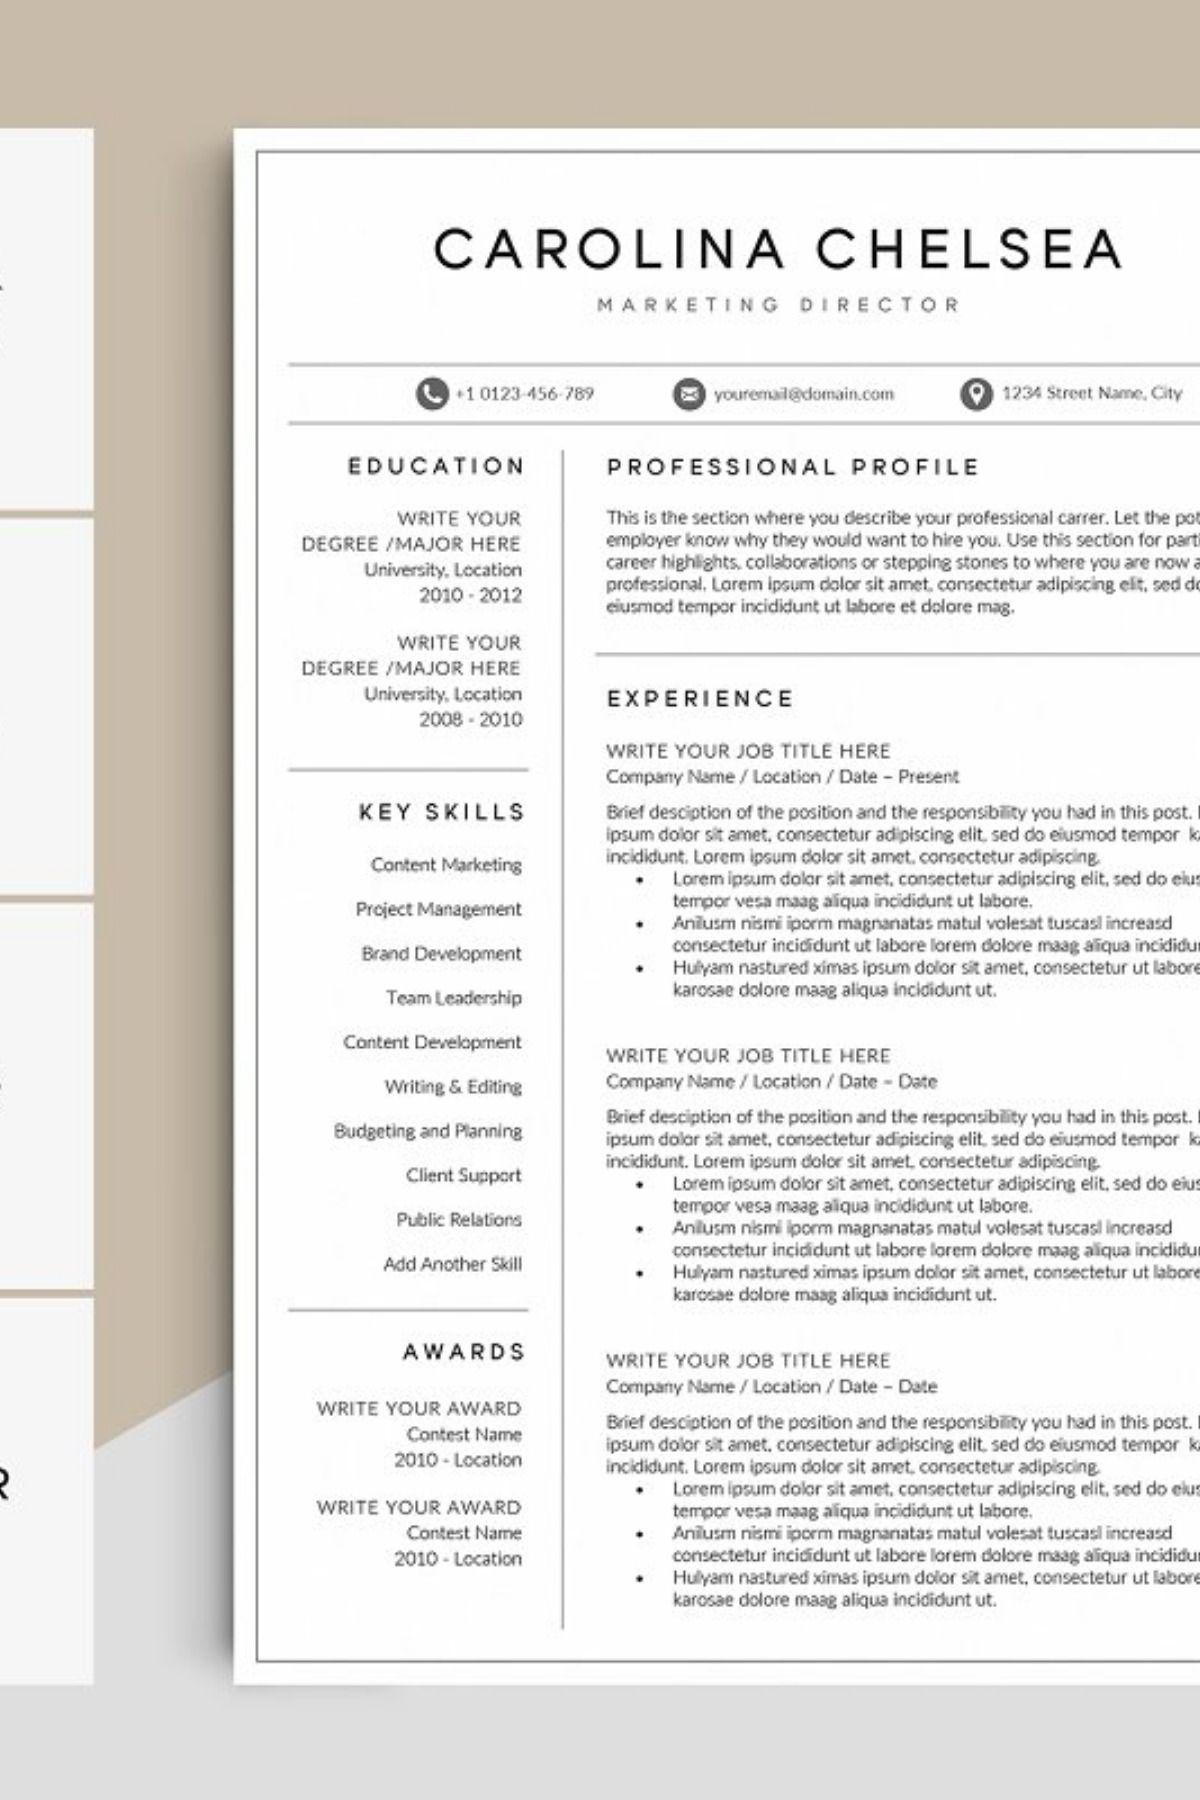 resume/cv template carolina best resume senior technical writer sample it project manager warehouse supervisor